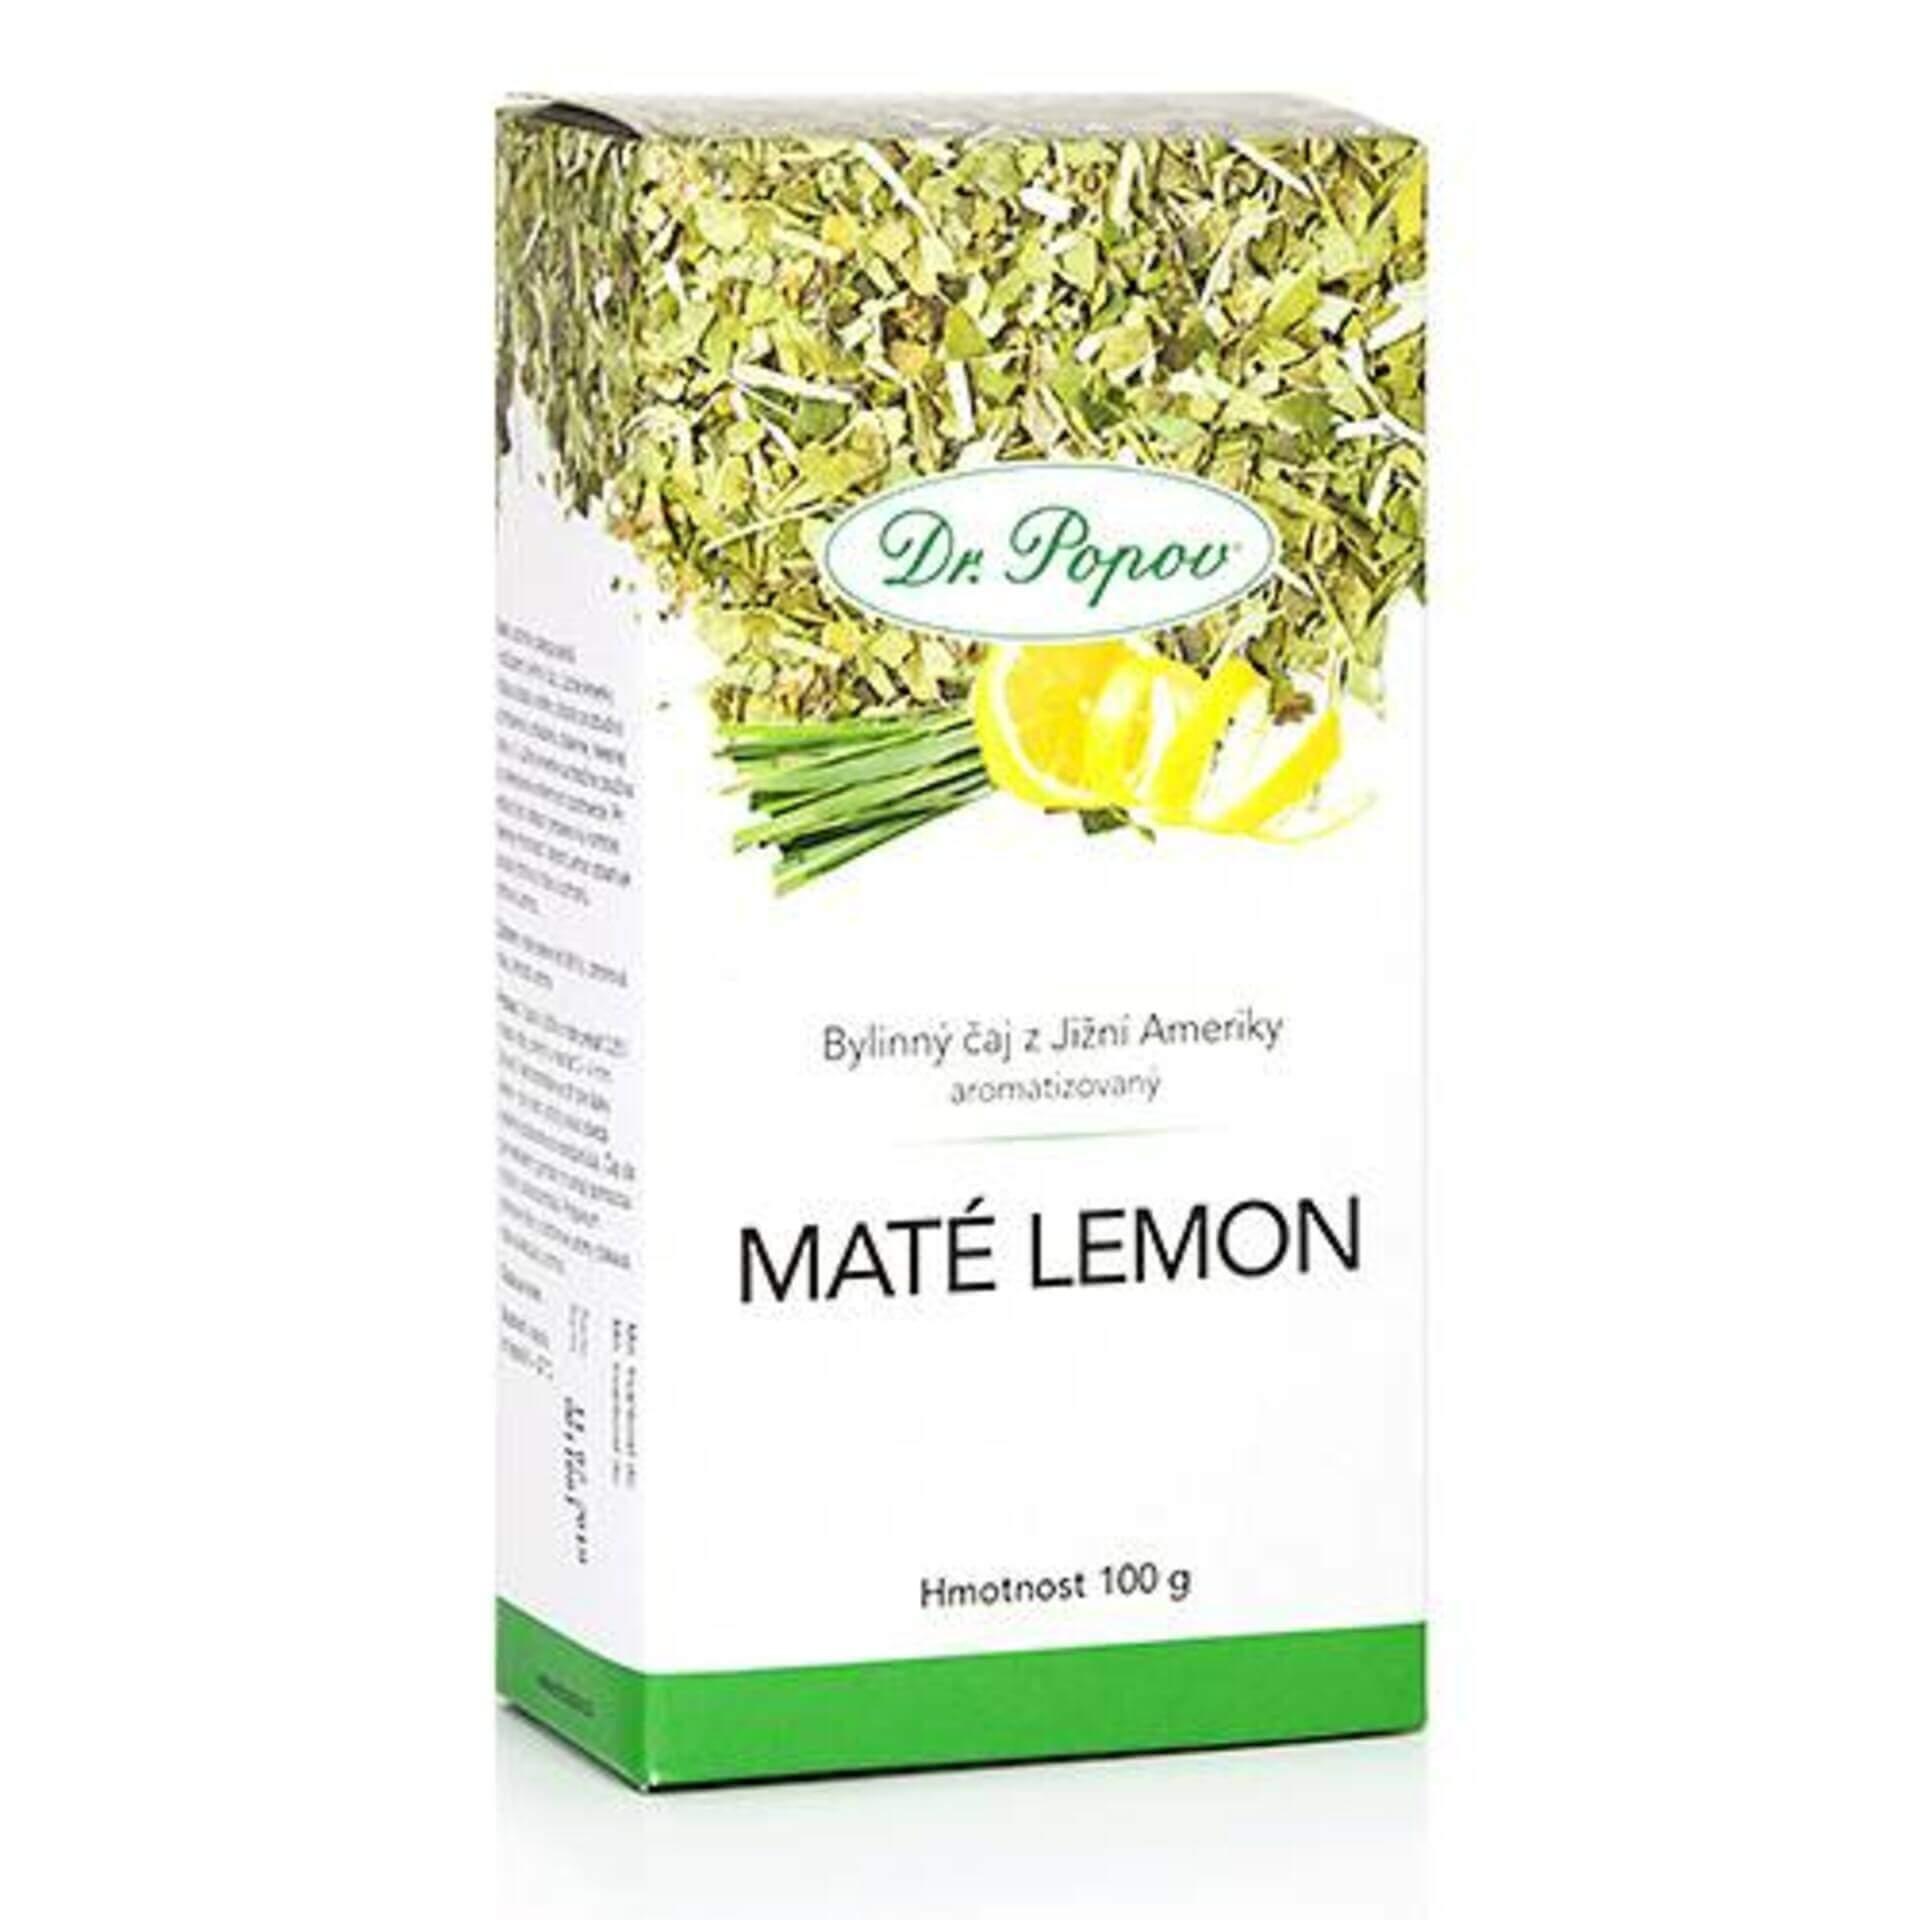 Dr. Popov Čaj maté lemon 100 g